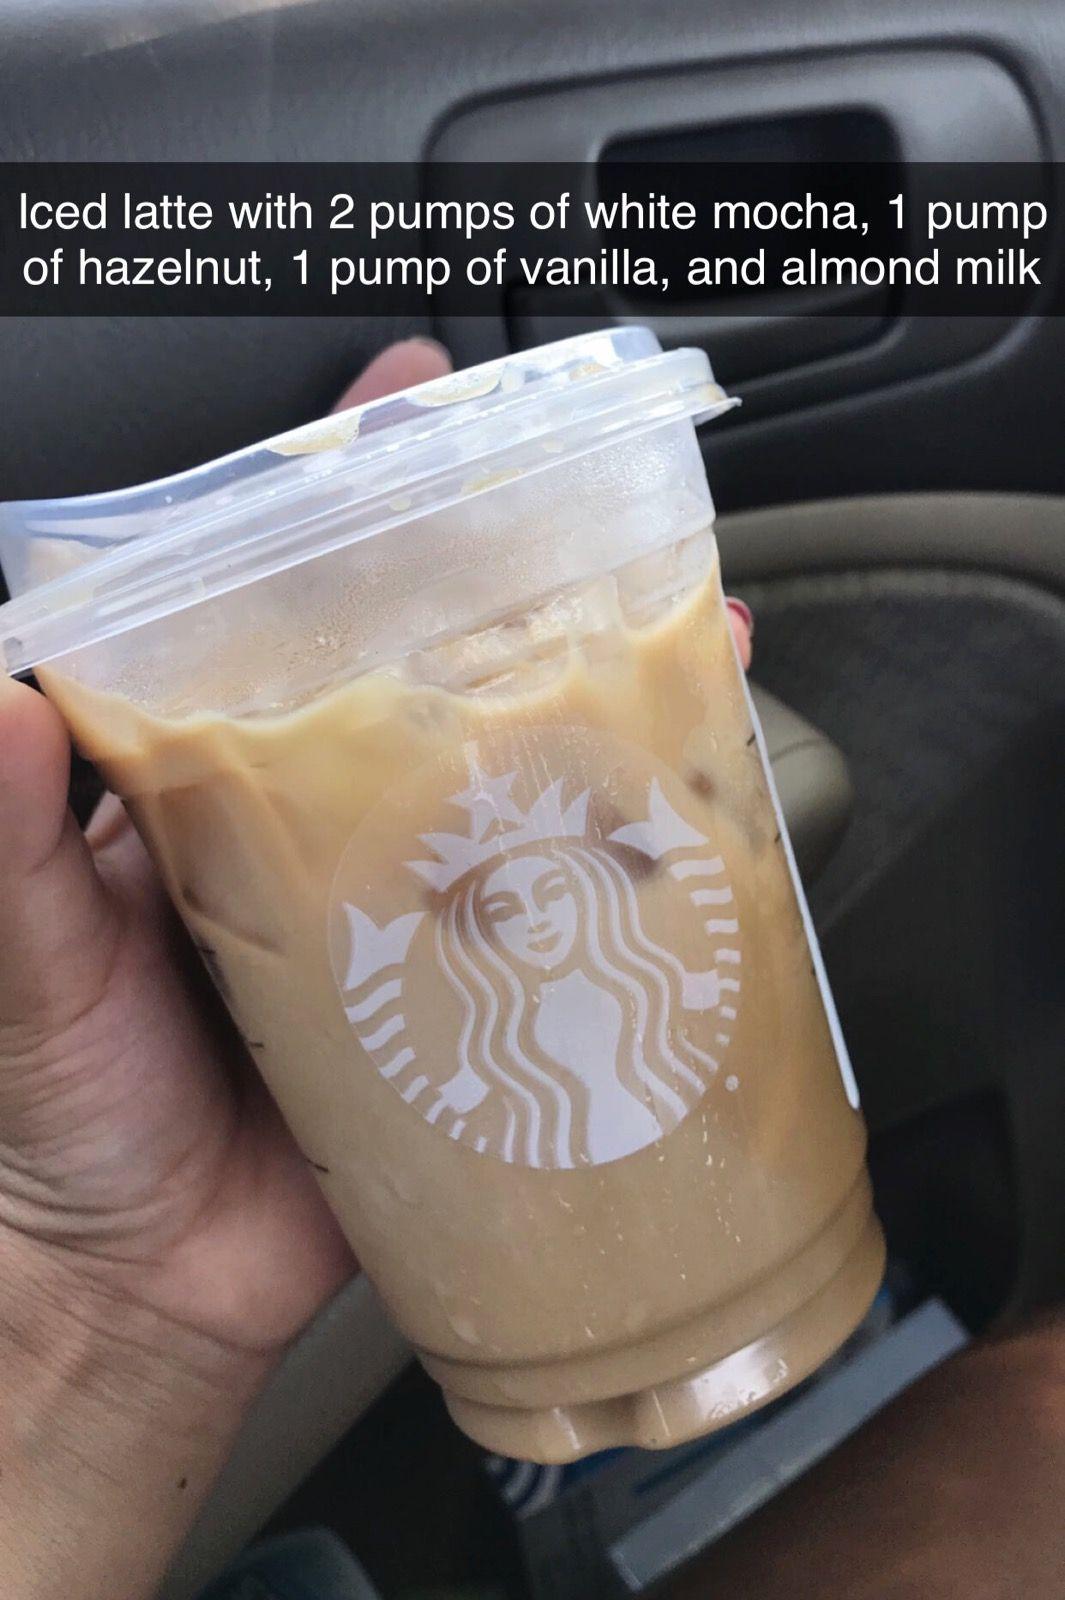 Pin By Juanita R Sandbeck On Starbucks Drinks Coffee Recipes Starbucks Healthy Starbucks Drinks Starbucks Drinks Recipes